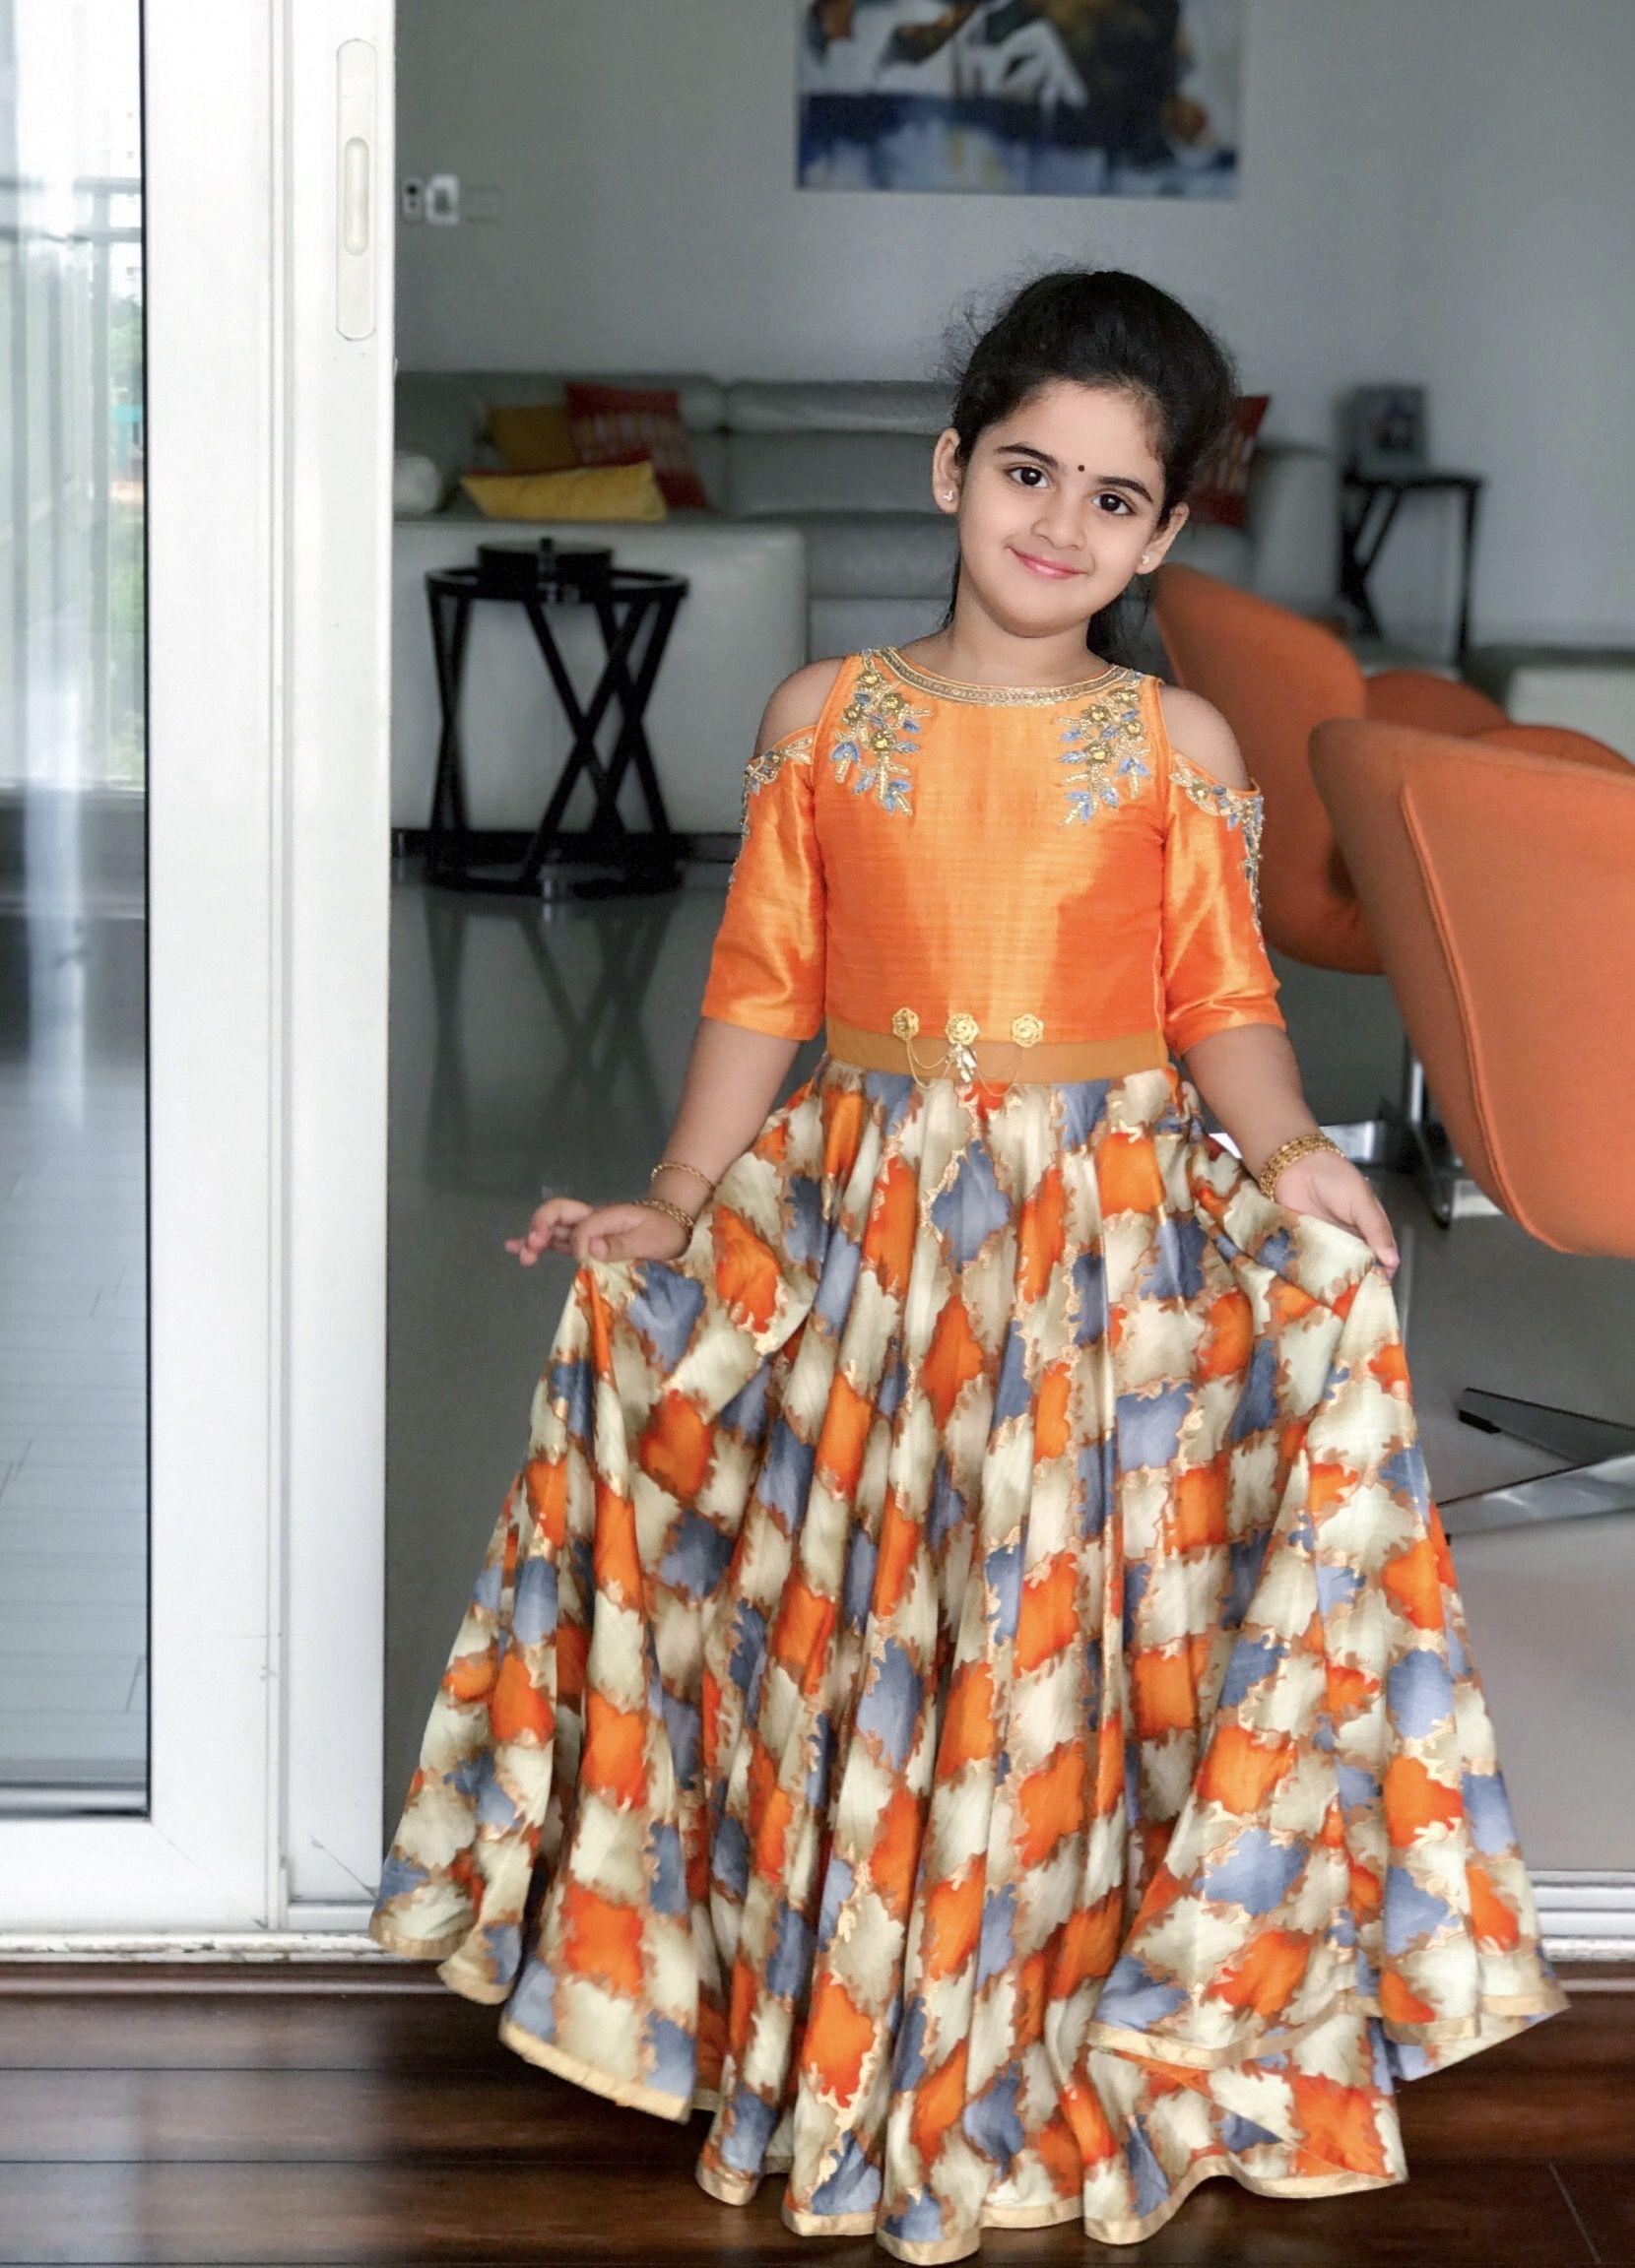 Party Wear For Girls Kids Designer Dresses Kids Lehenga Choli Kids Dress,Living Room Bedroom Home Furniture Design